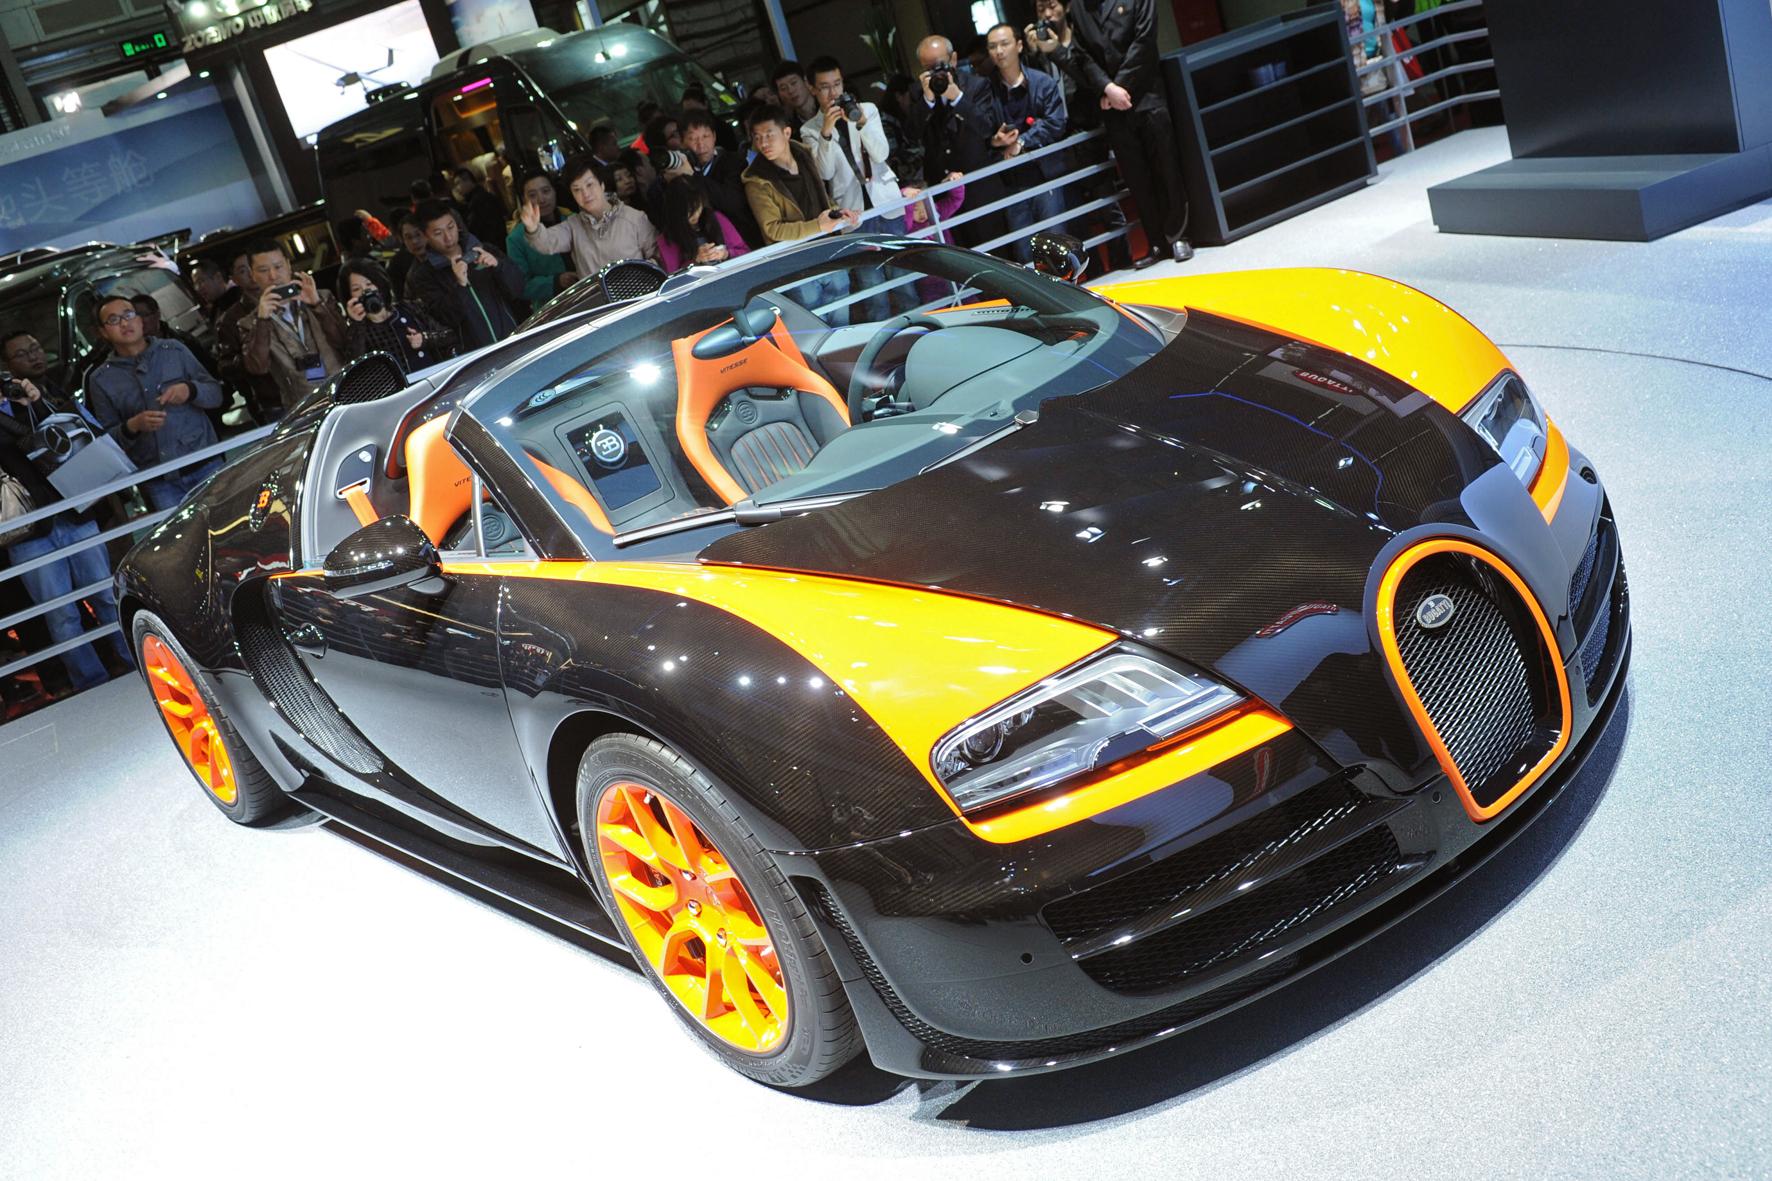 der tuningblogger bugatti veyron 16 4 grand sport vitesse auto shanghai 1. Black Bedroom Furniture Sets. Home Design Ideas